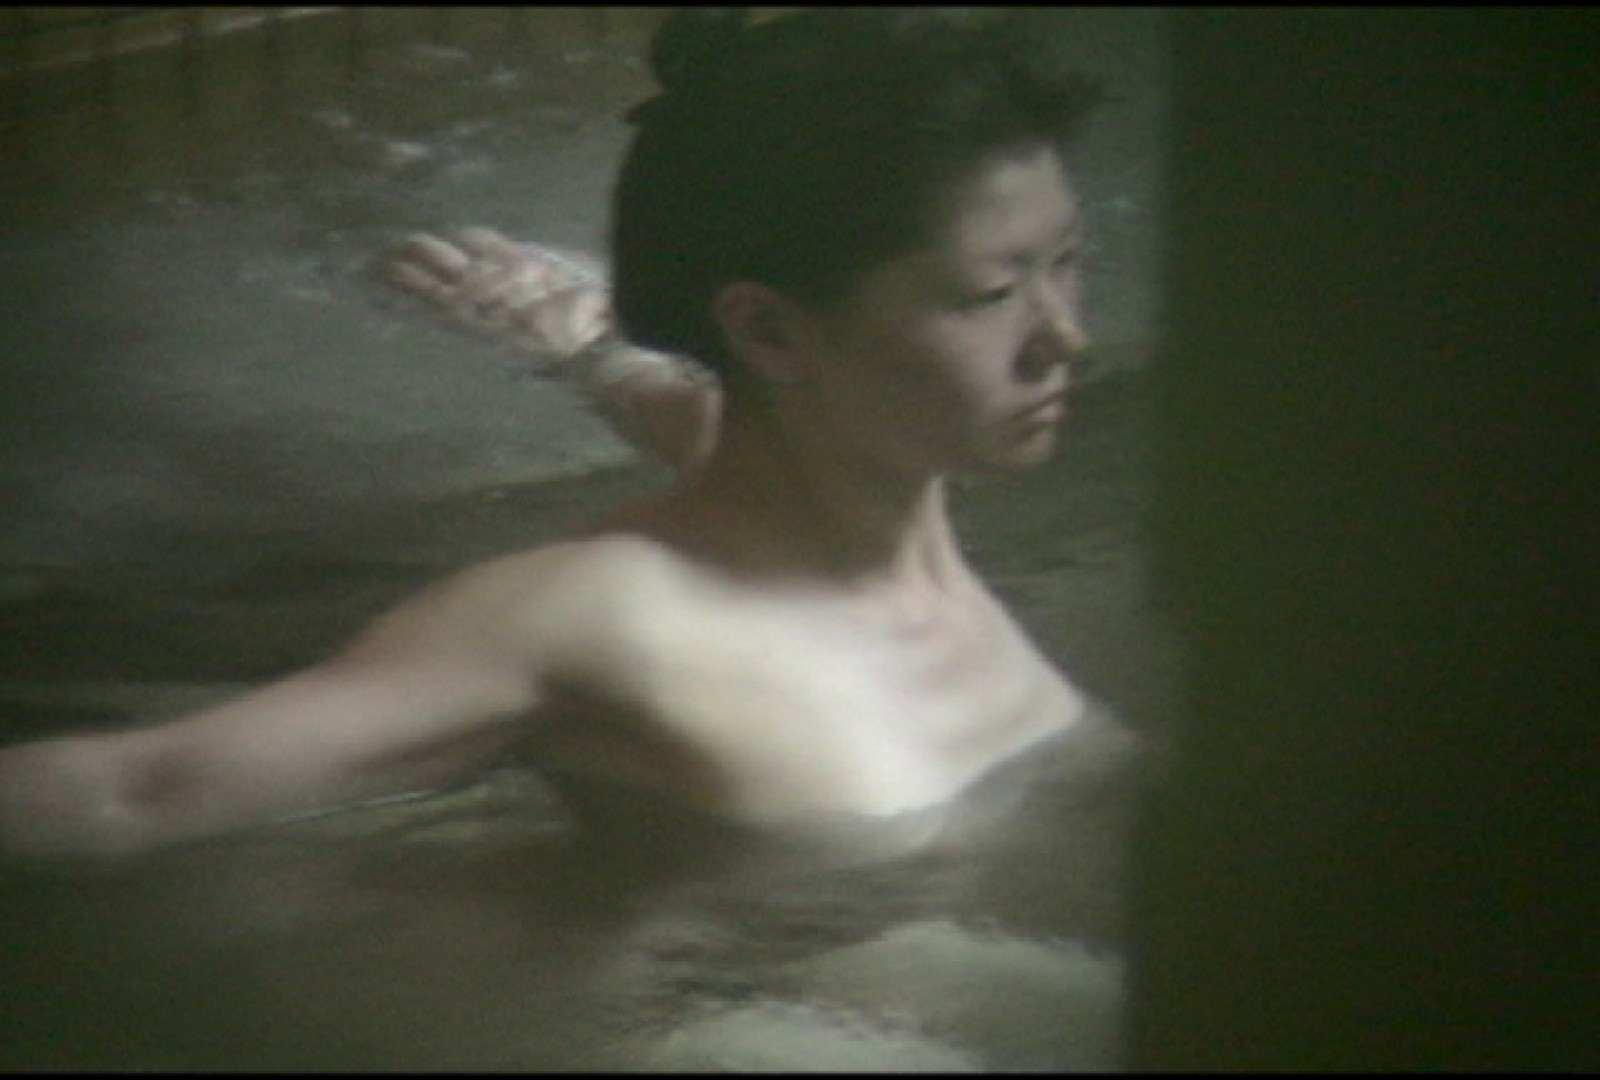 Aquaな露天風呂Vol.699 OL女体 えろ無修正画像 60連発 26